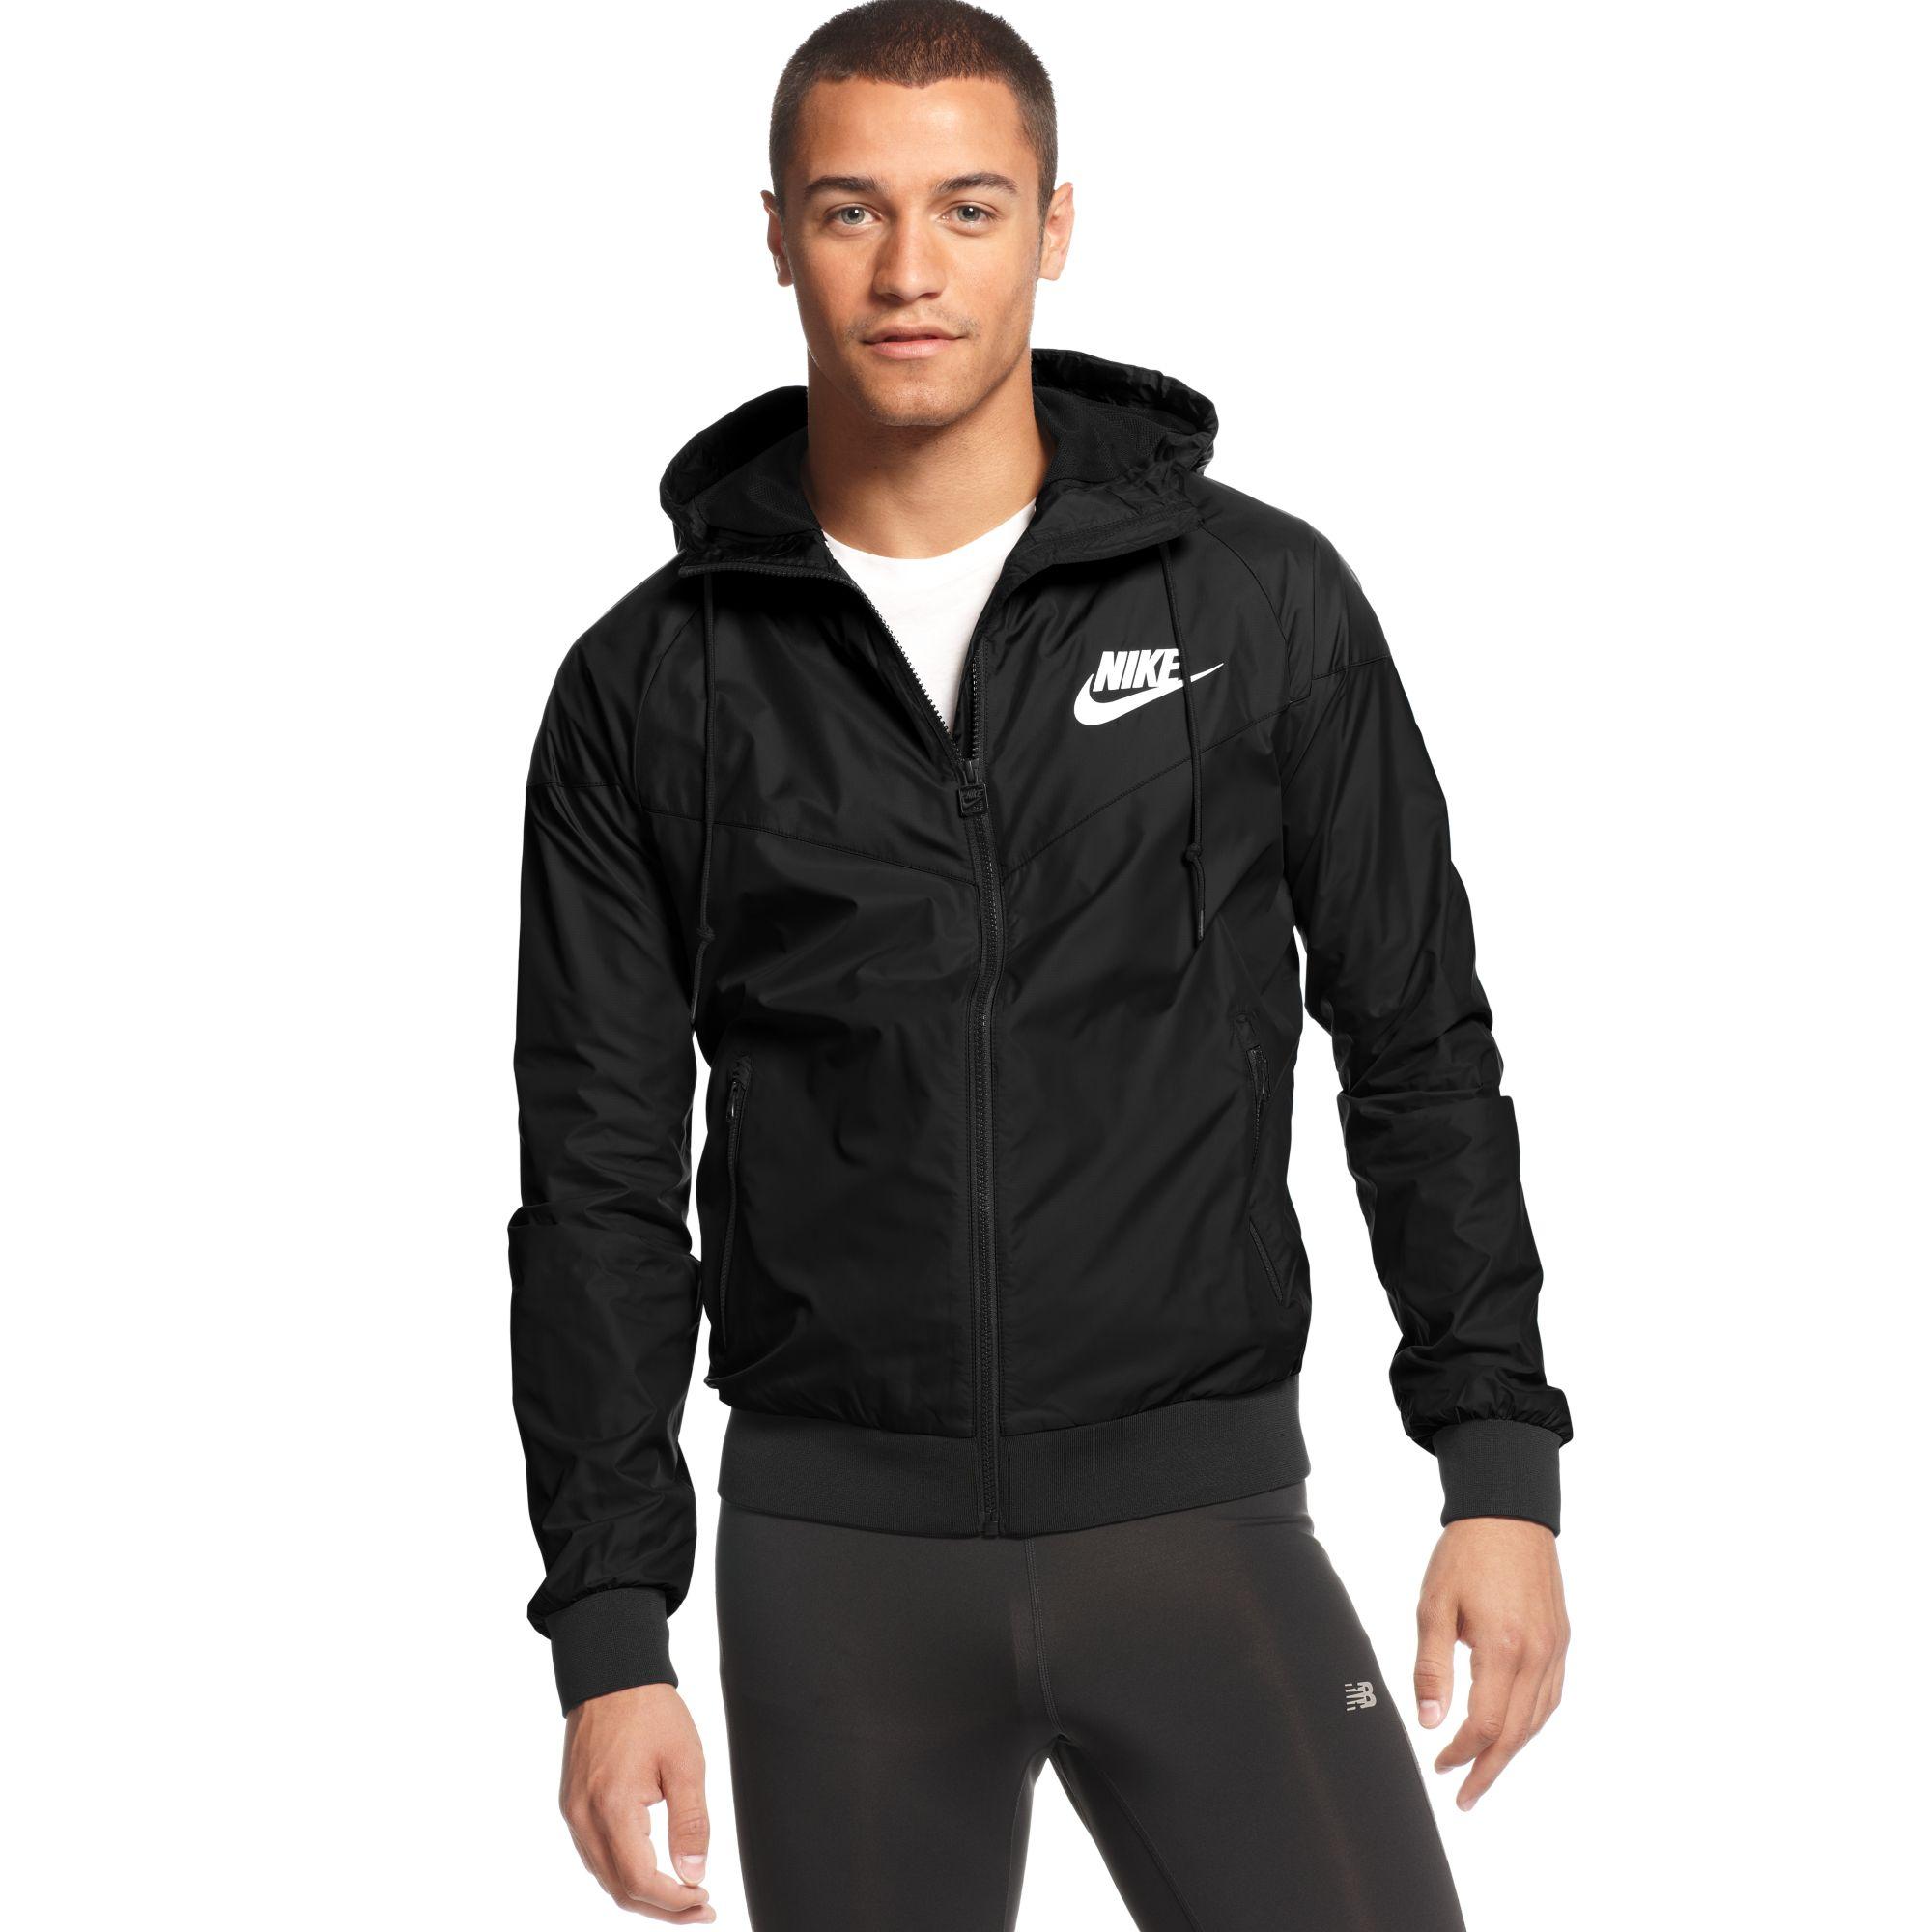 4b348802c14f Lyst - Nike Wind Runner Hooded Jacket in Black for Men